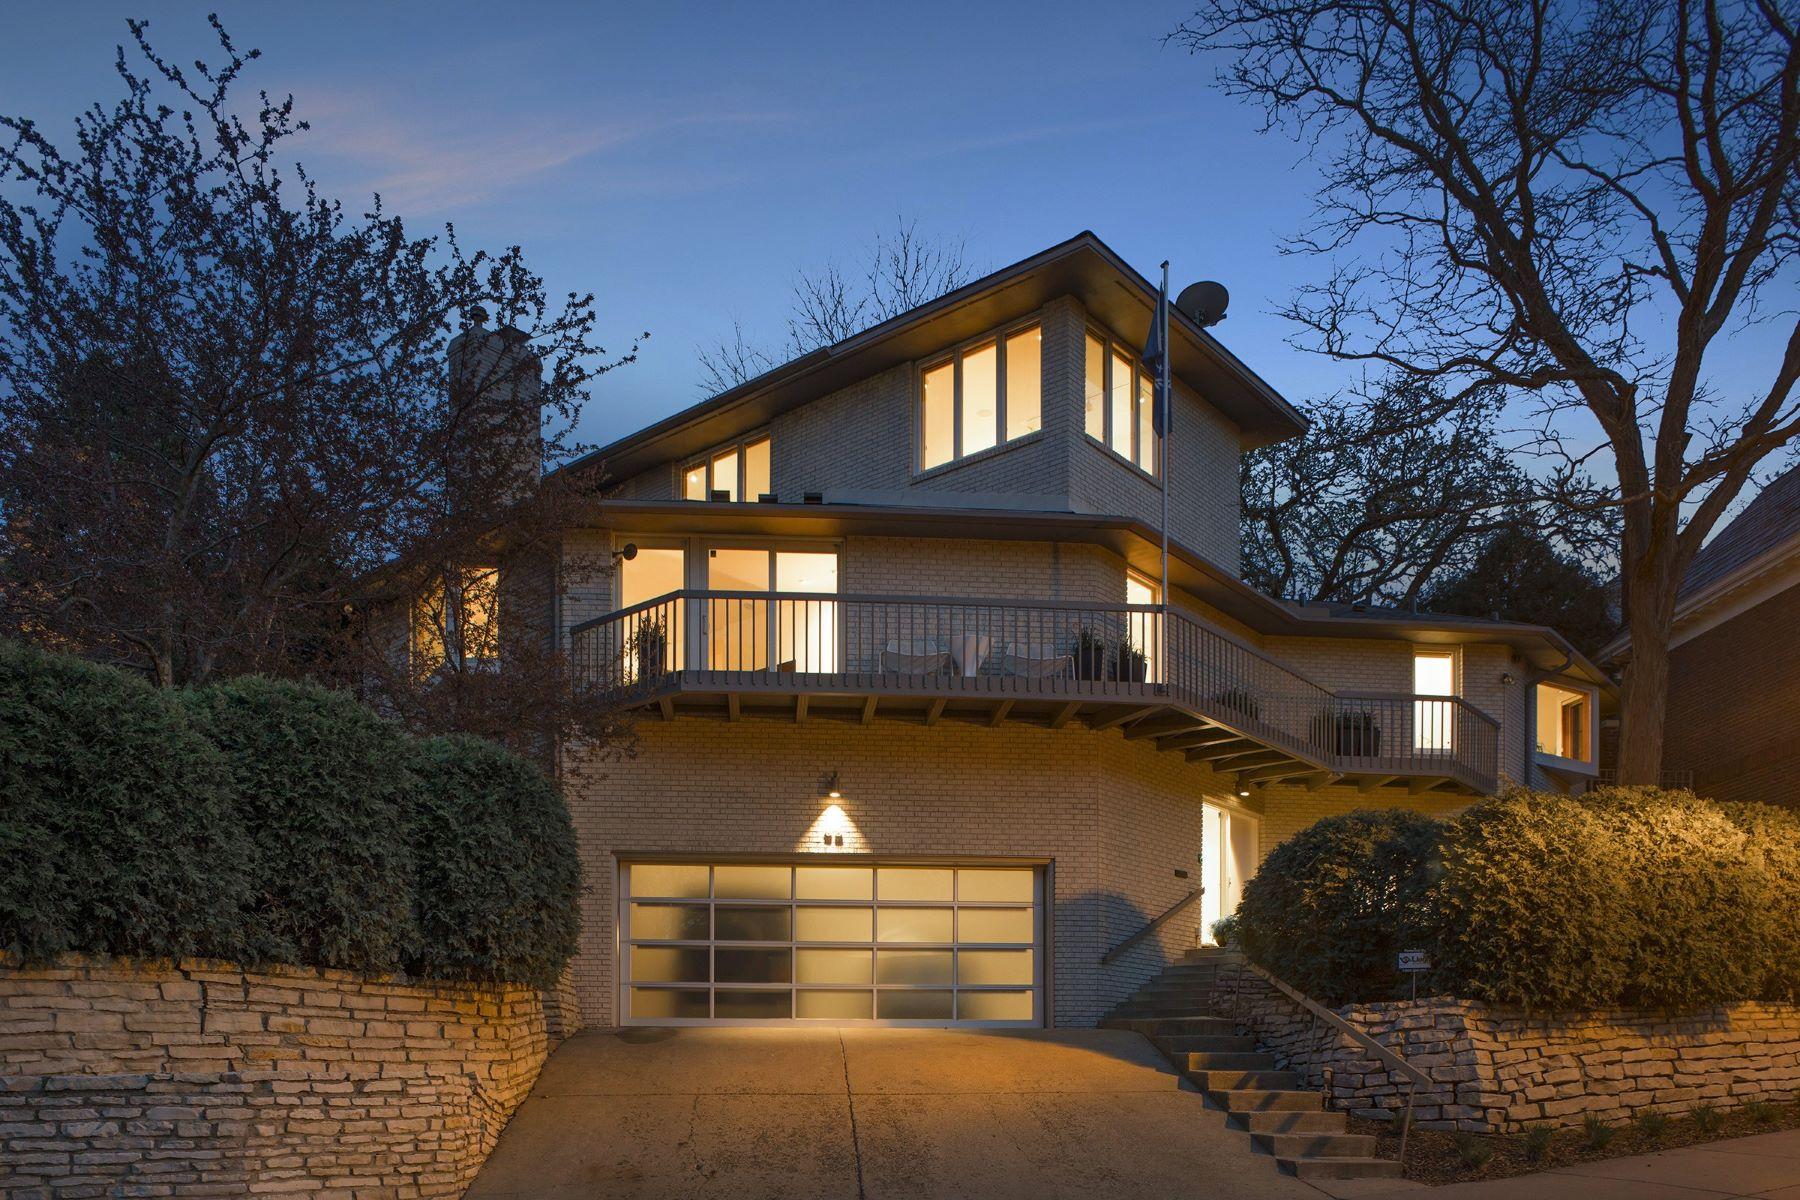 Single Family Home for Sale at 93 Groveland Terrace Minneapolis, Minnesota, 55403 United States